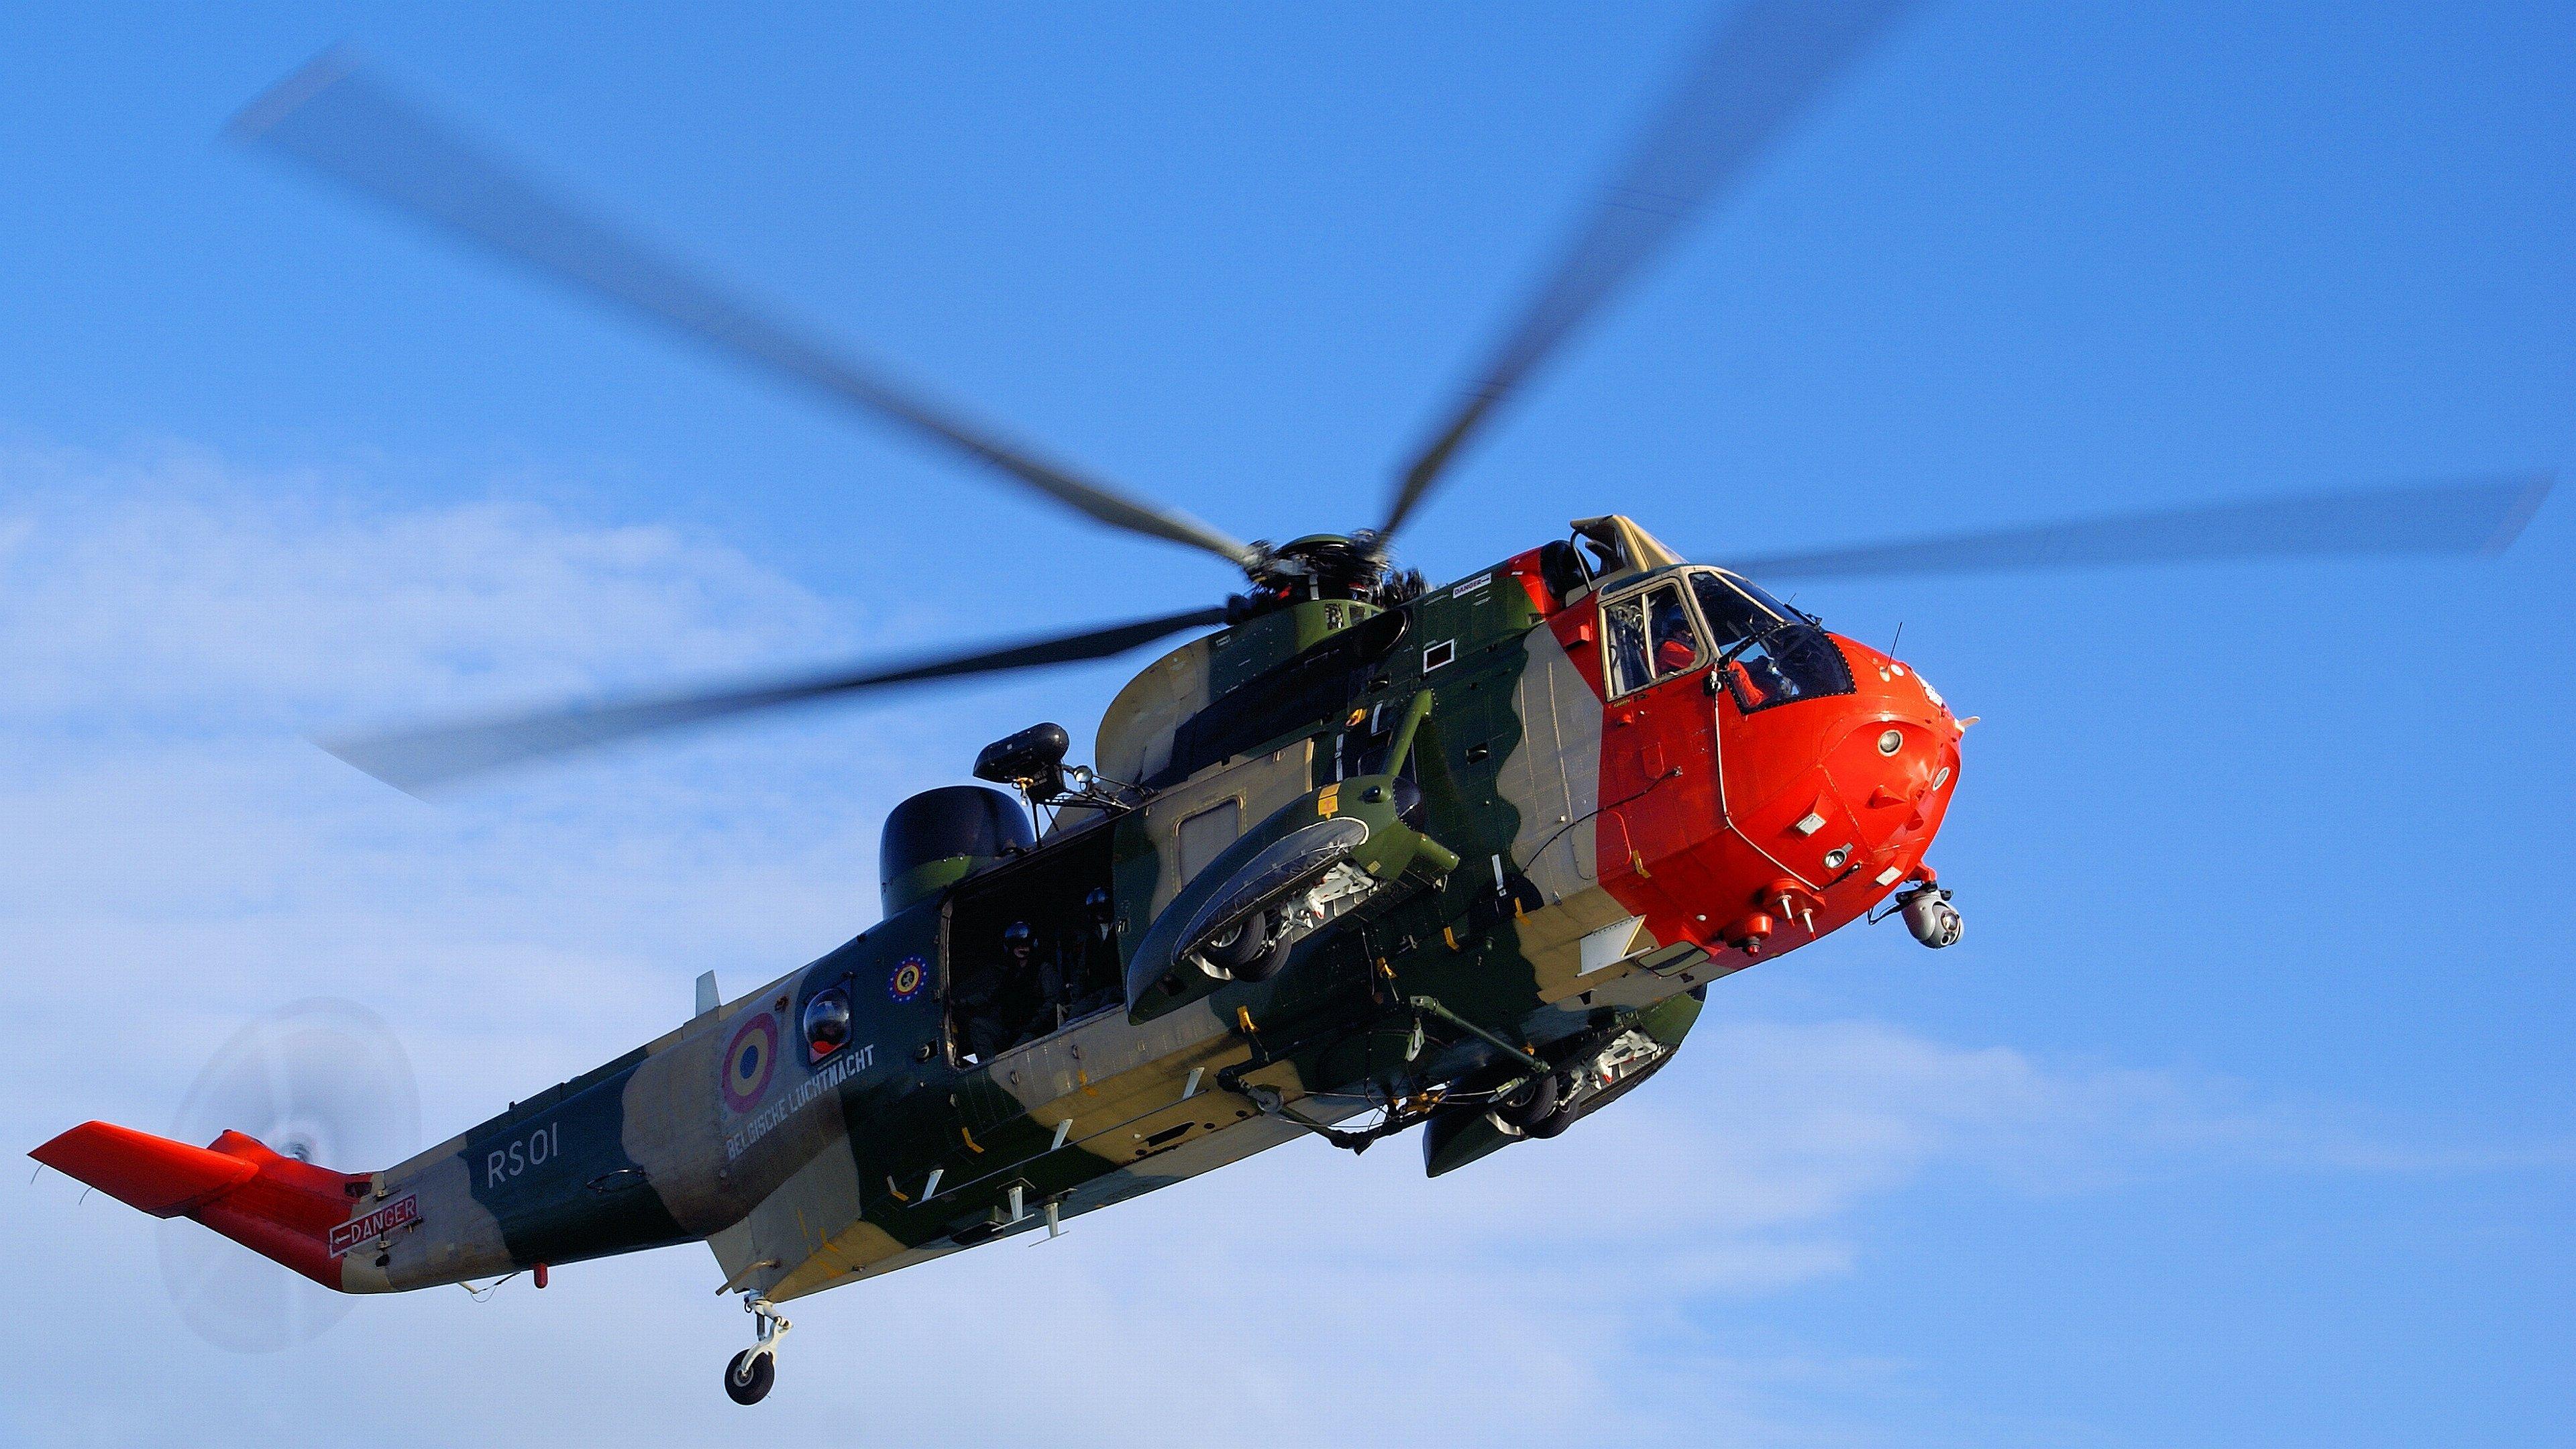 Military Helicopter 4k Hd Desktop Wallpaper For 4k Ultra: Helicopter Wallpapers 3840x2160 Ultra HD 4k Desktop